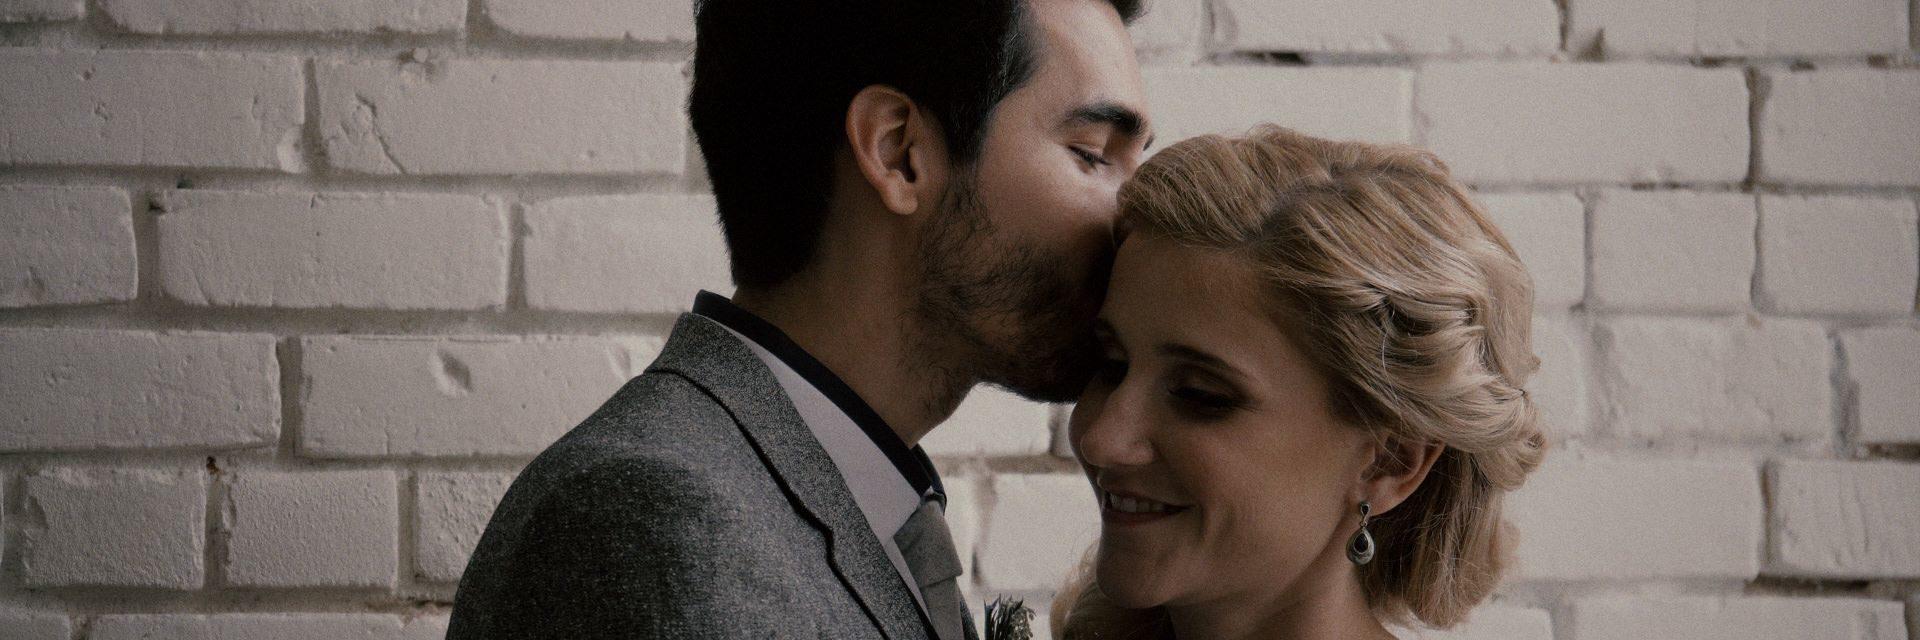 Faro-wedding-videographer-cinemate-films-03